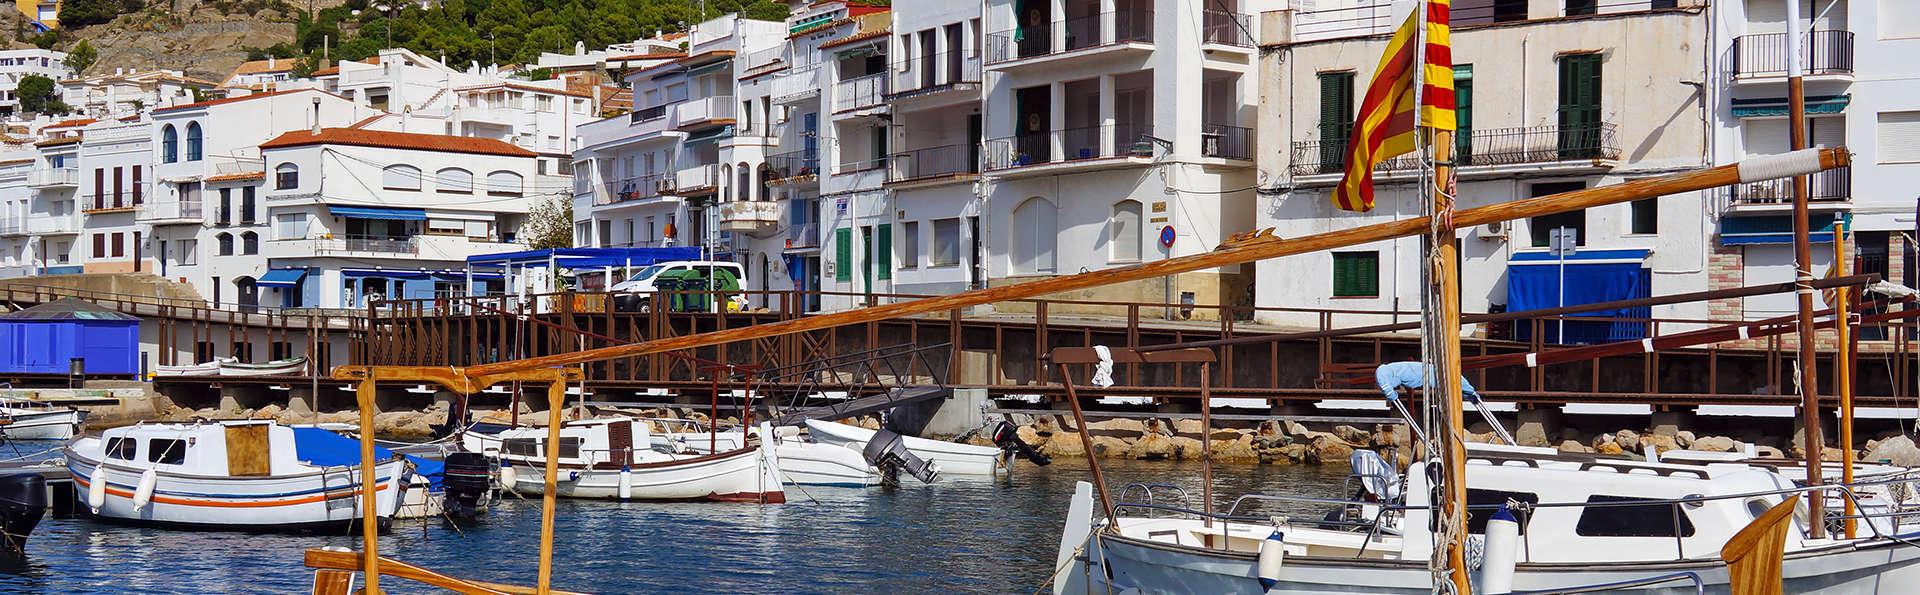 Hotel Spa Cap de Creus - Edit_PortDeLaSelva.jpg